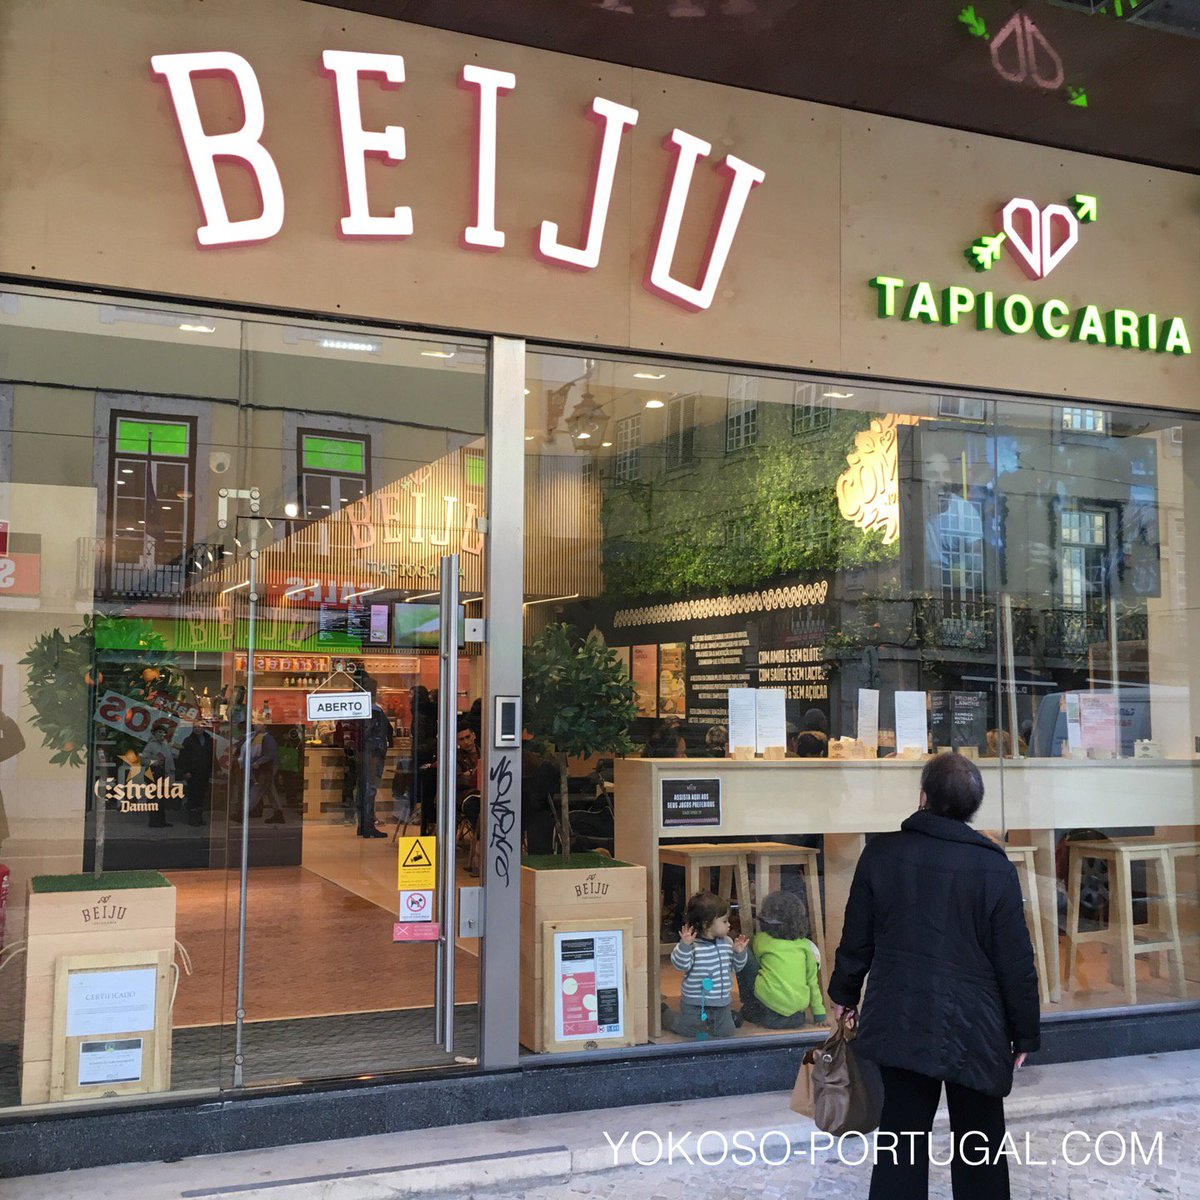 test ツイッターメディア - リスボンのフィゲイラ広場近く、ブラジルのお菓子、タピオカの粉のクレープ屋さん。ポルトガルではブラジルの文化も気軽に楽しめます。 (@ Beiju Tapiocaria in Lisboa) https://t.co/XMVNKRMpZq https://t.co/uqCYKSdnPN